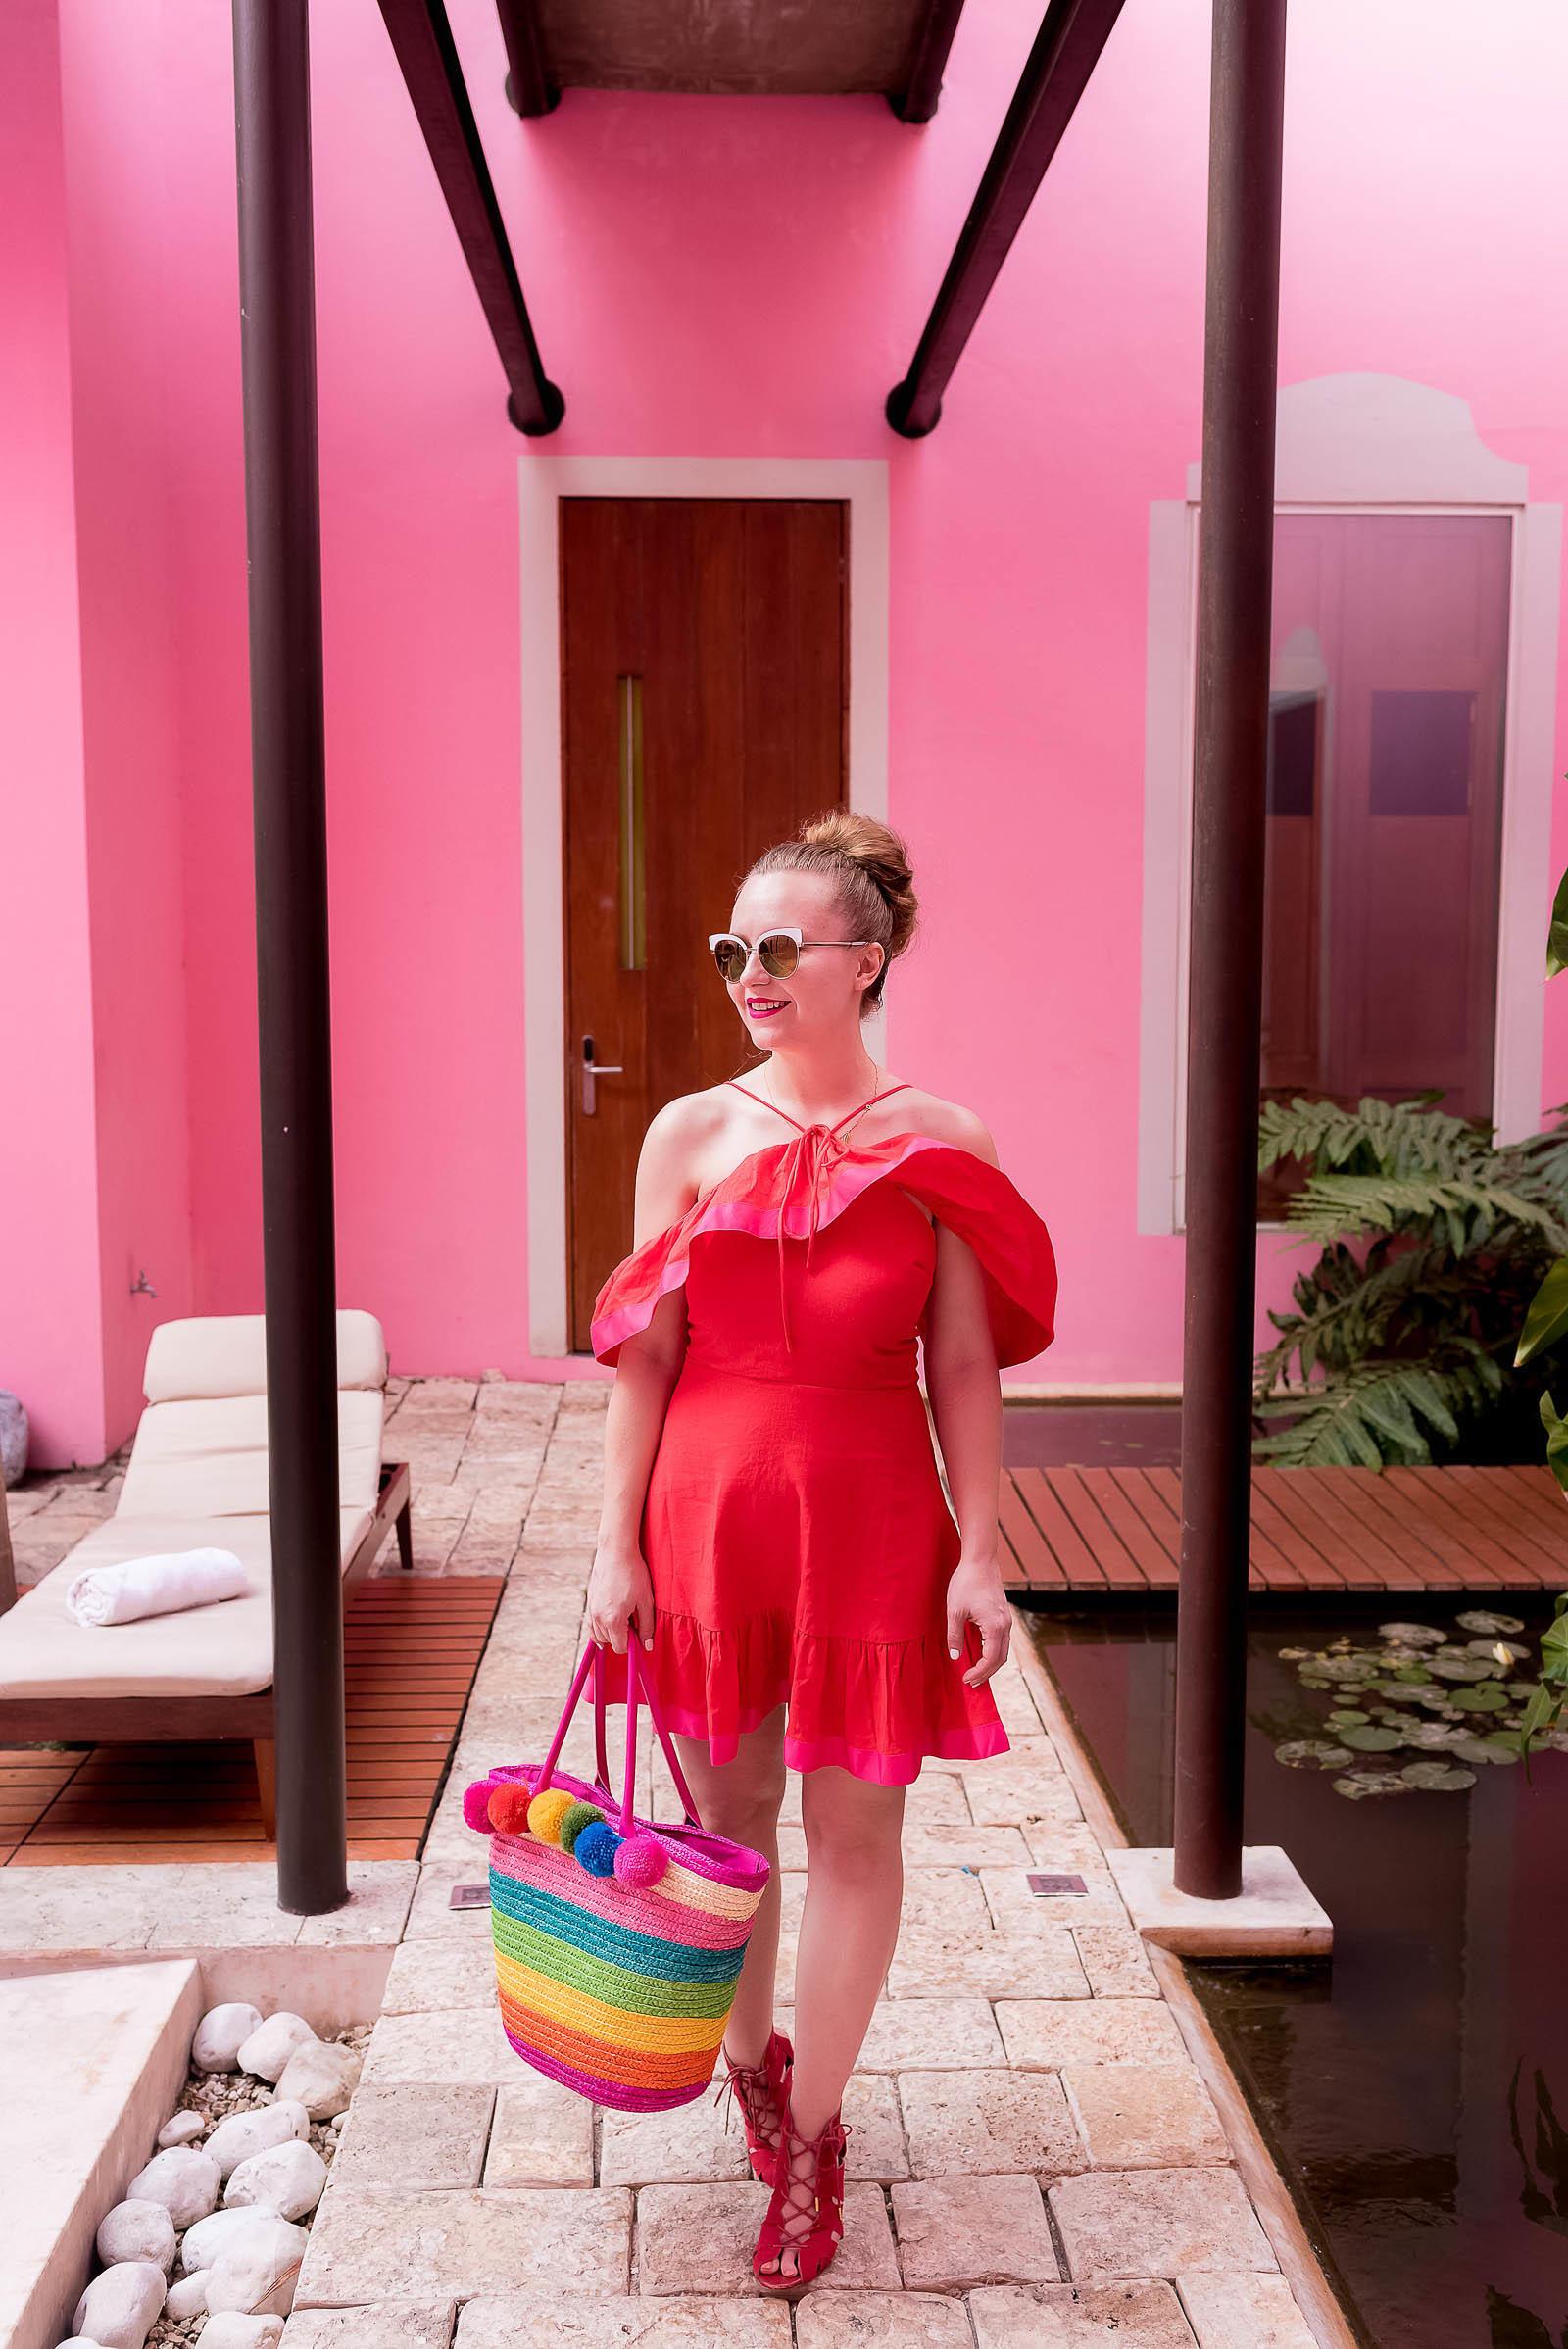 Rosas and Xocolate Hotel Merida Mexico